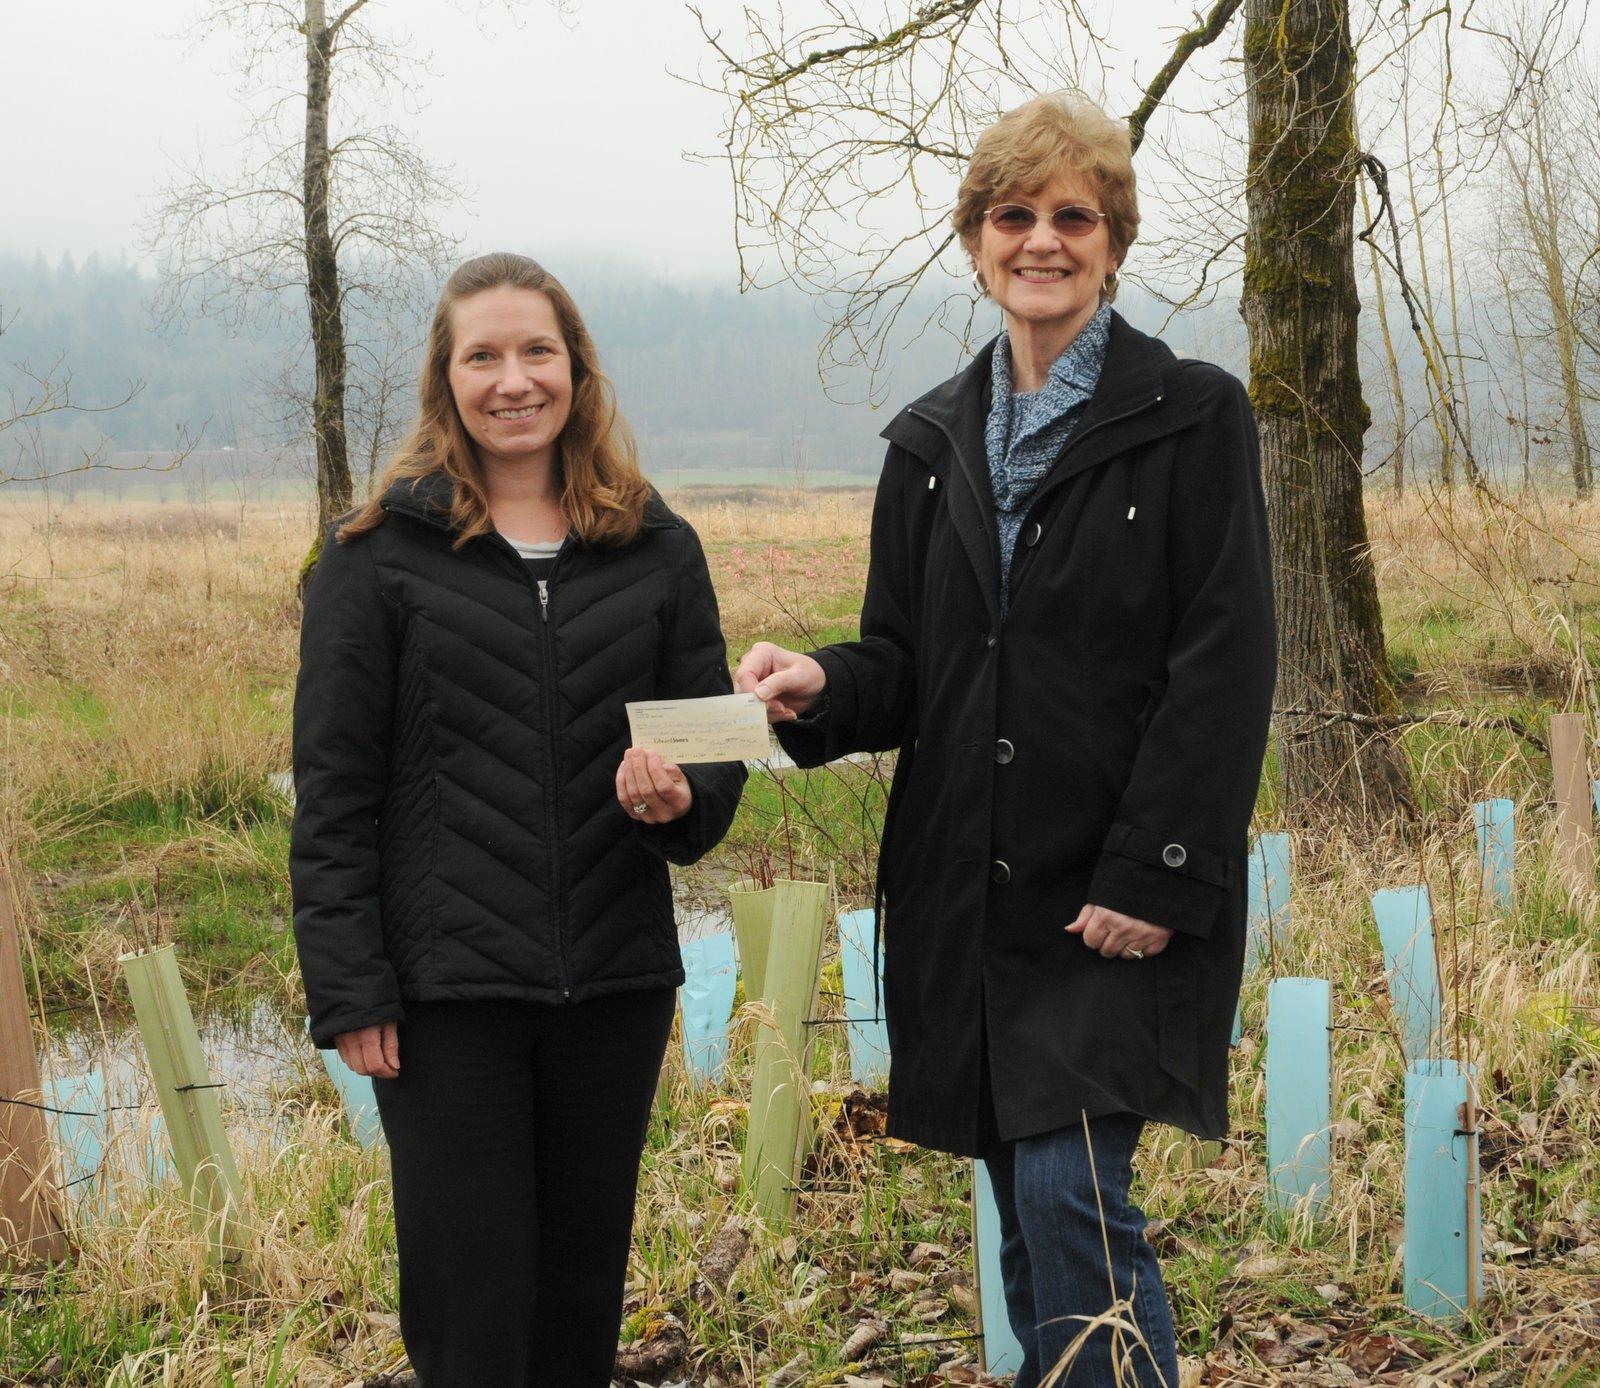 Treasurer Marianne distributing 2013 grant to Lower Columbia Estuary Partnership